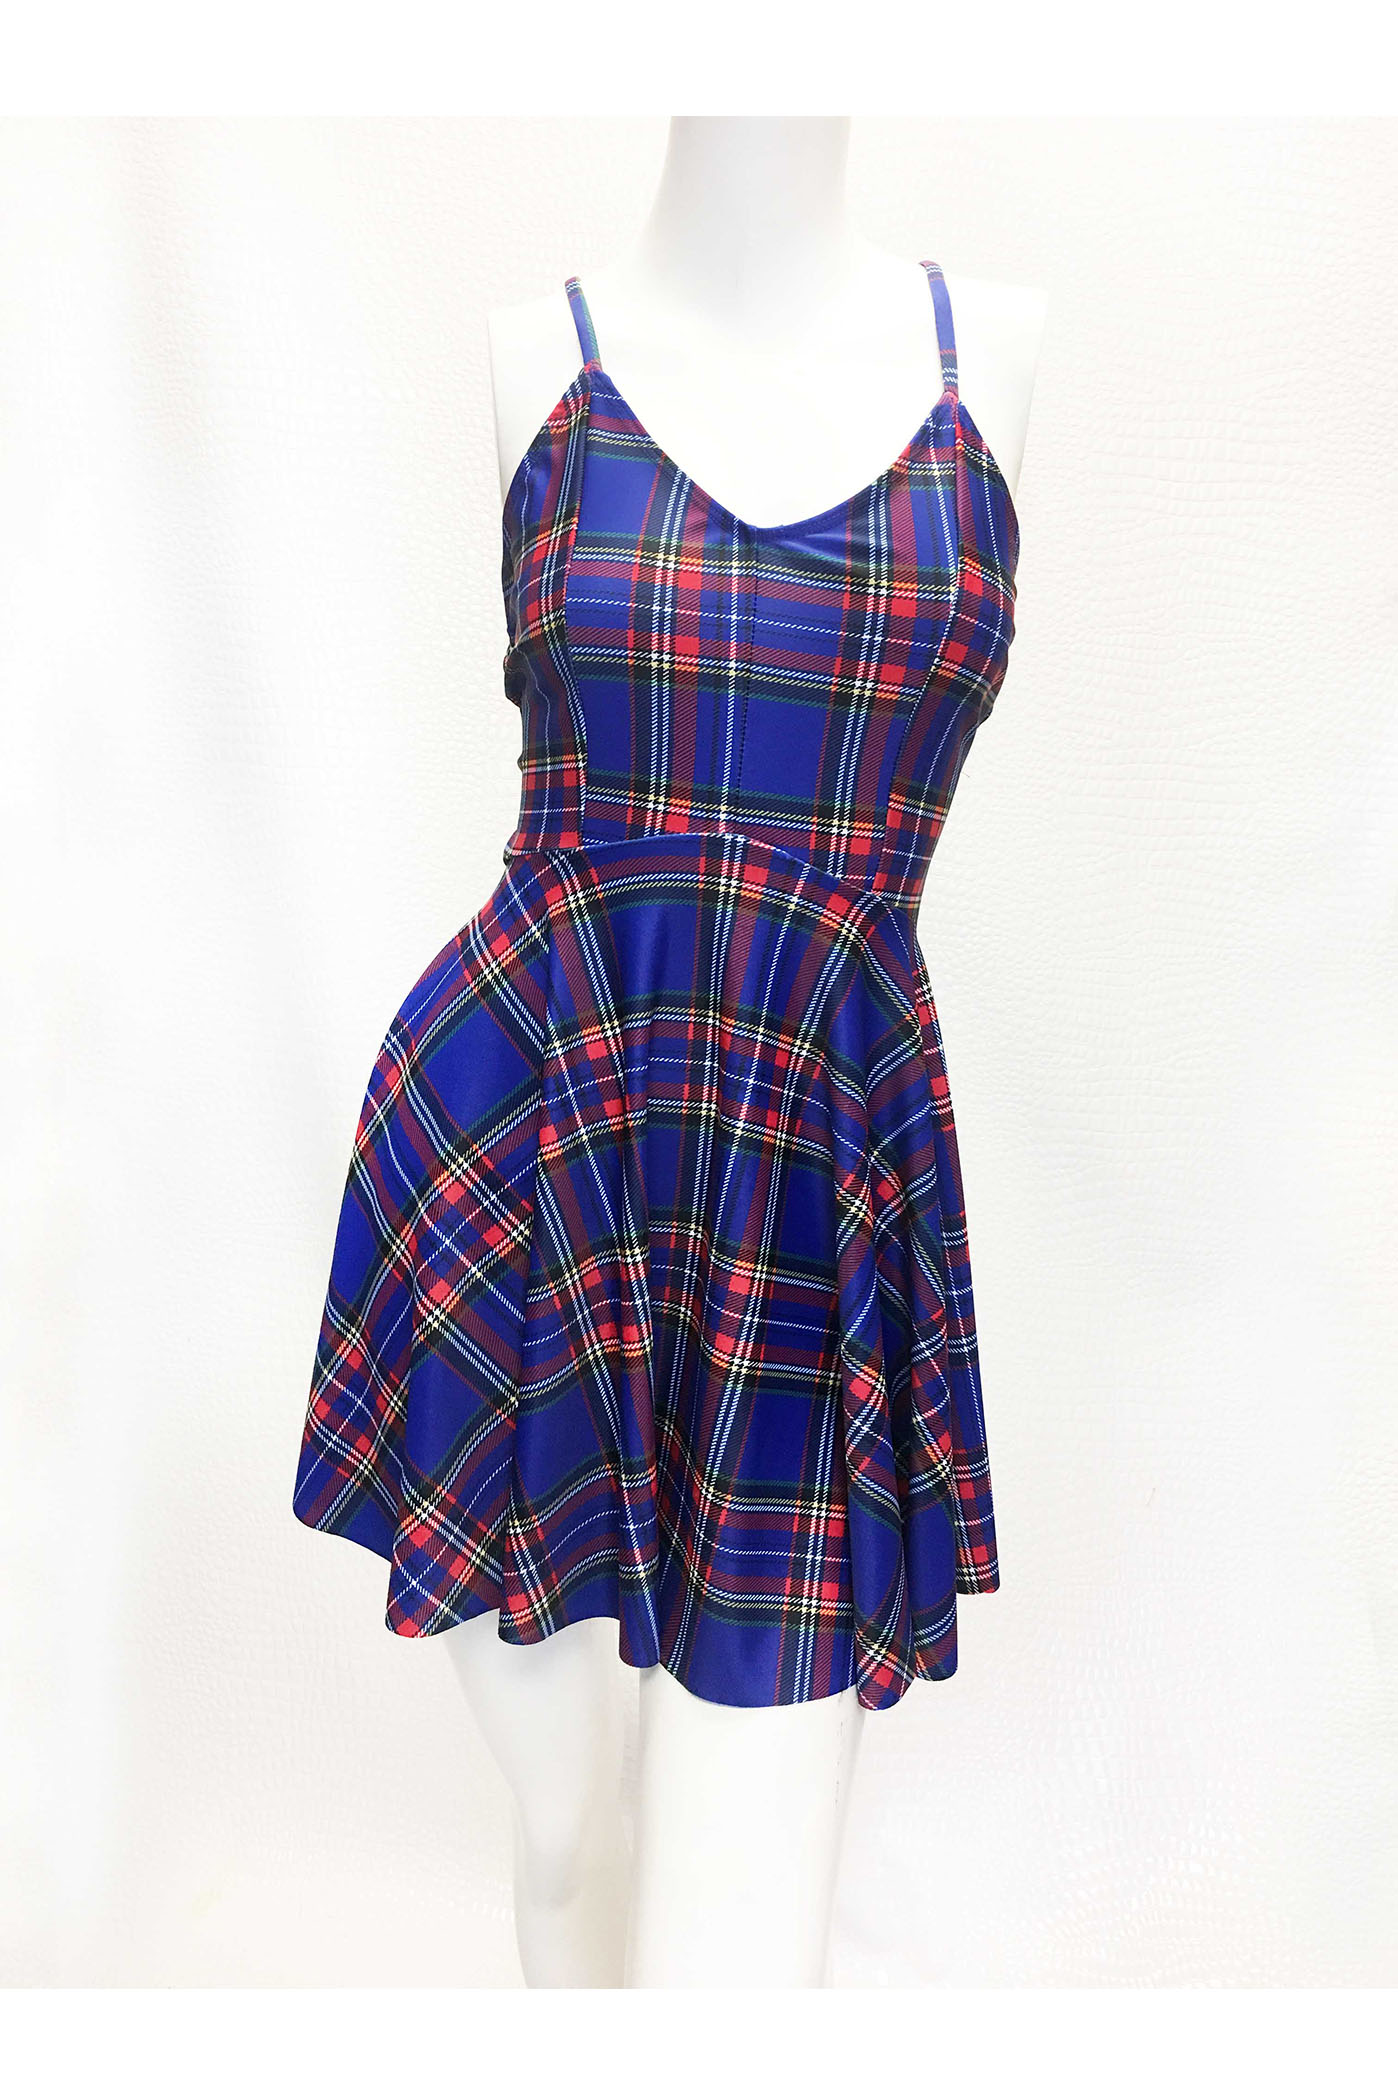 Rebel Yell Punk Rock Plaid Dress Kelly Maglia